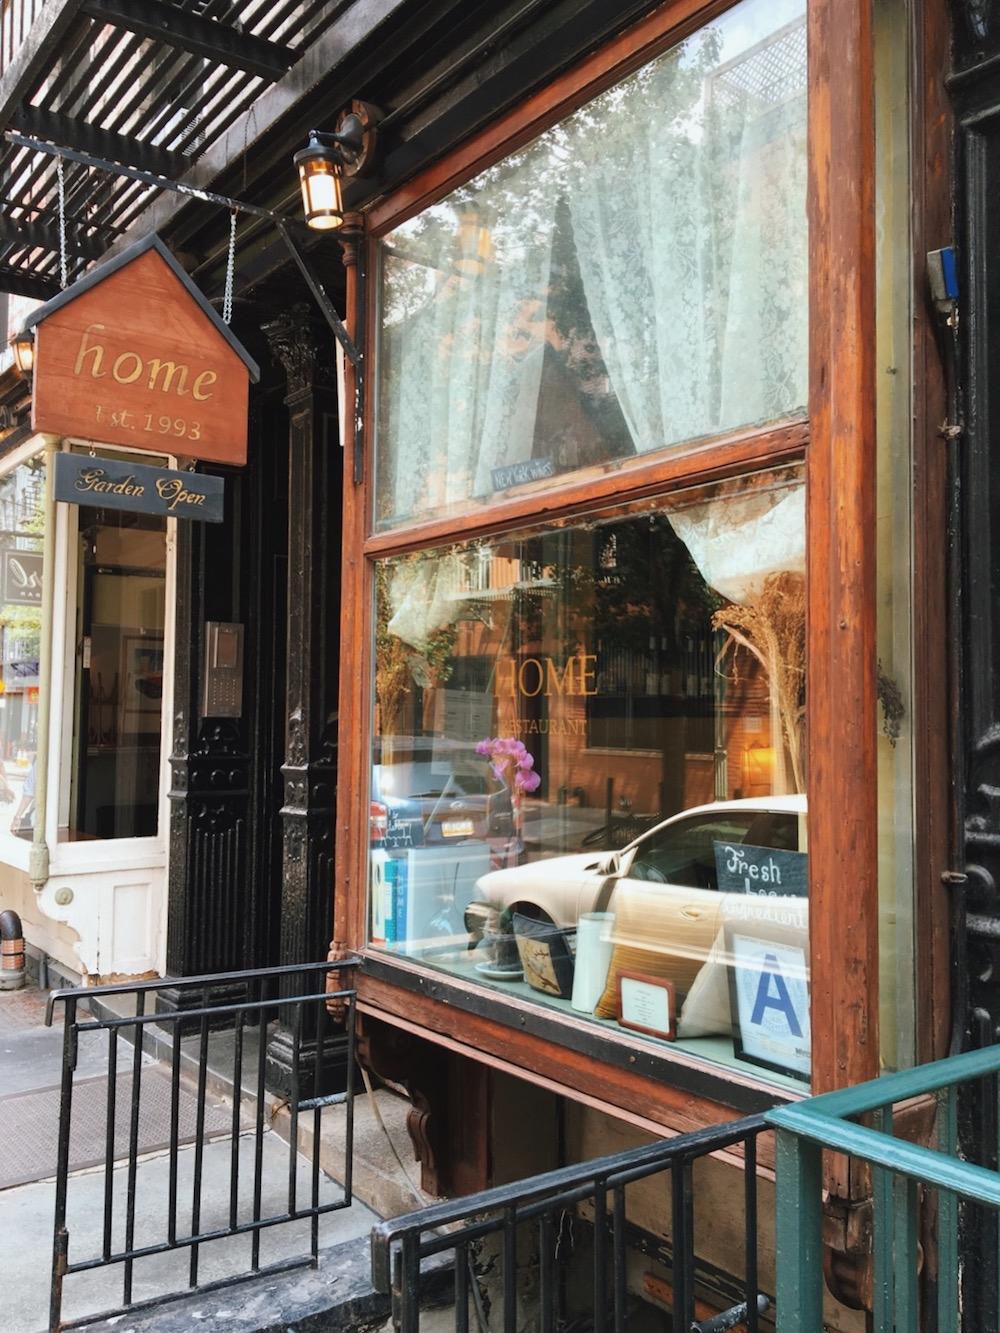 Home Restaurant Cornelia Street